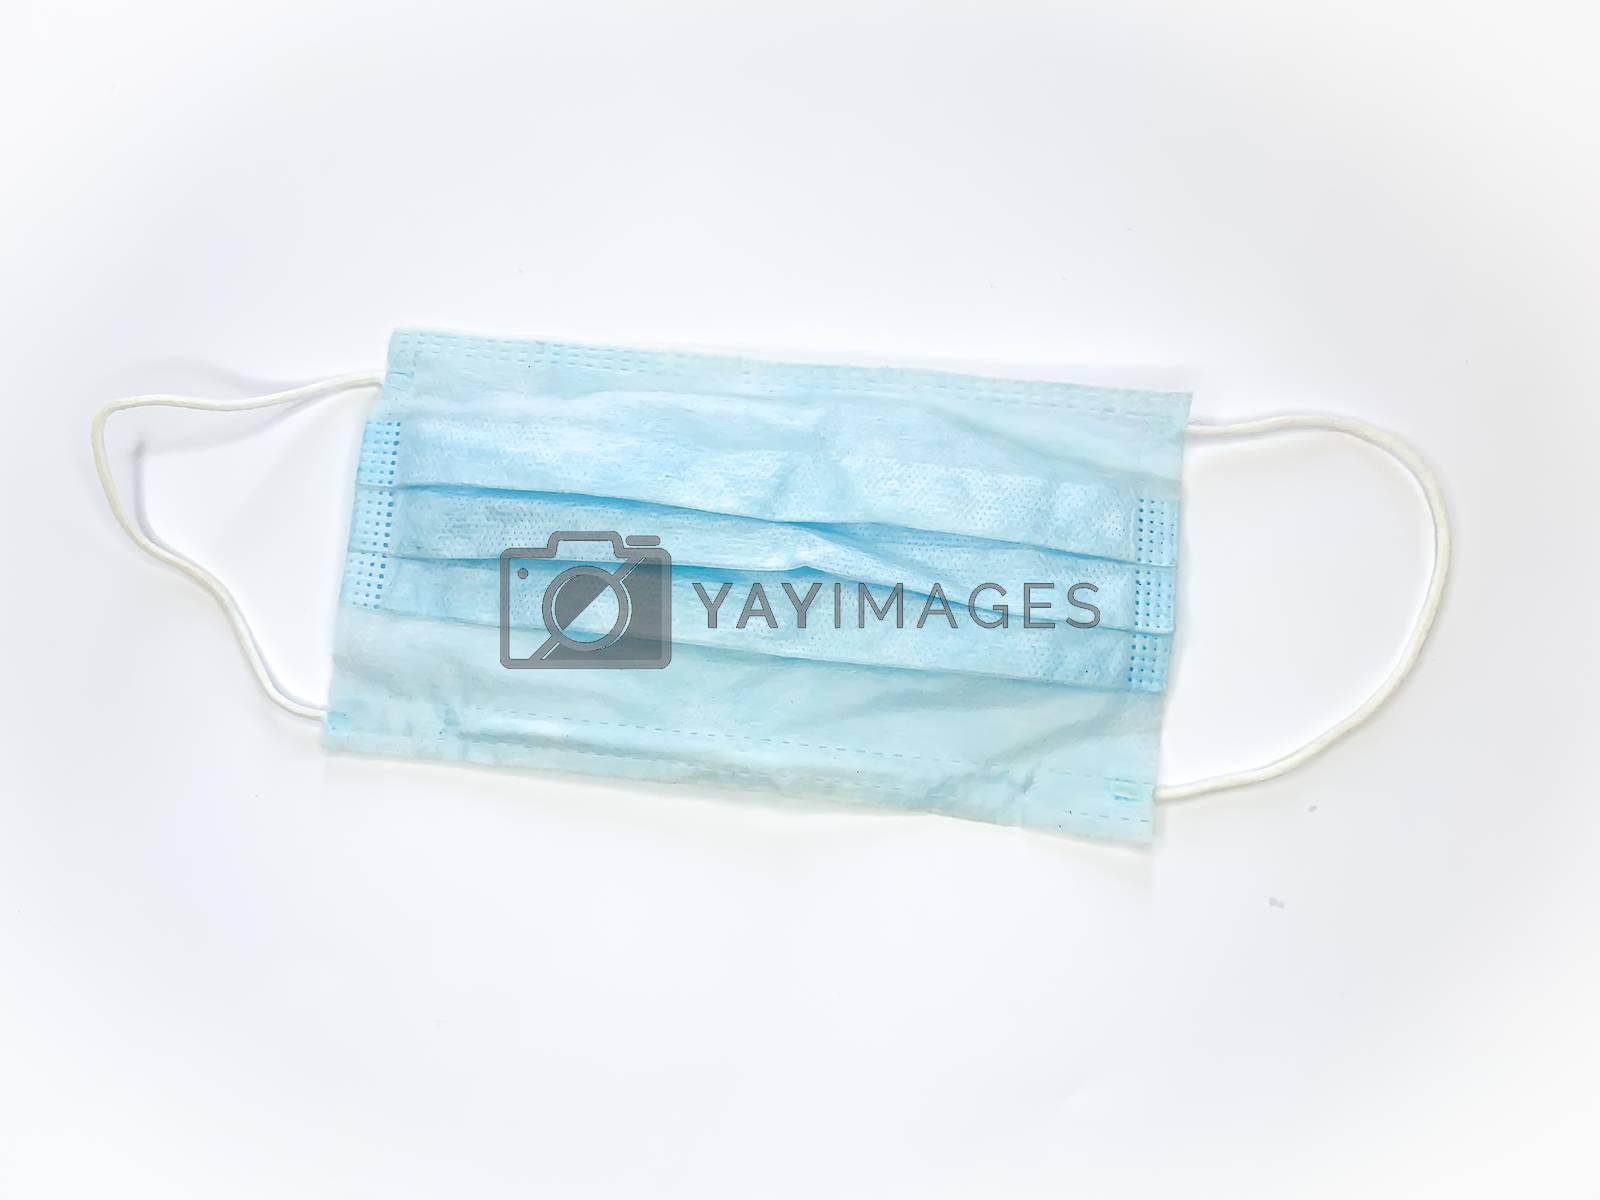 Antibacterial medical mask of blue color on a white background virus epidemic corona virus protection